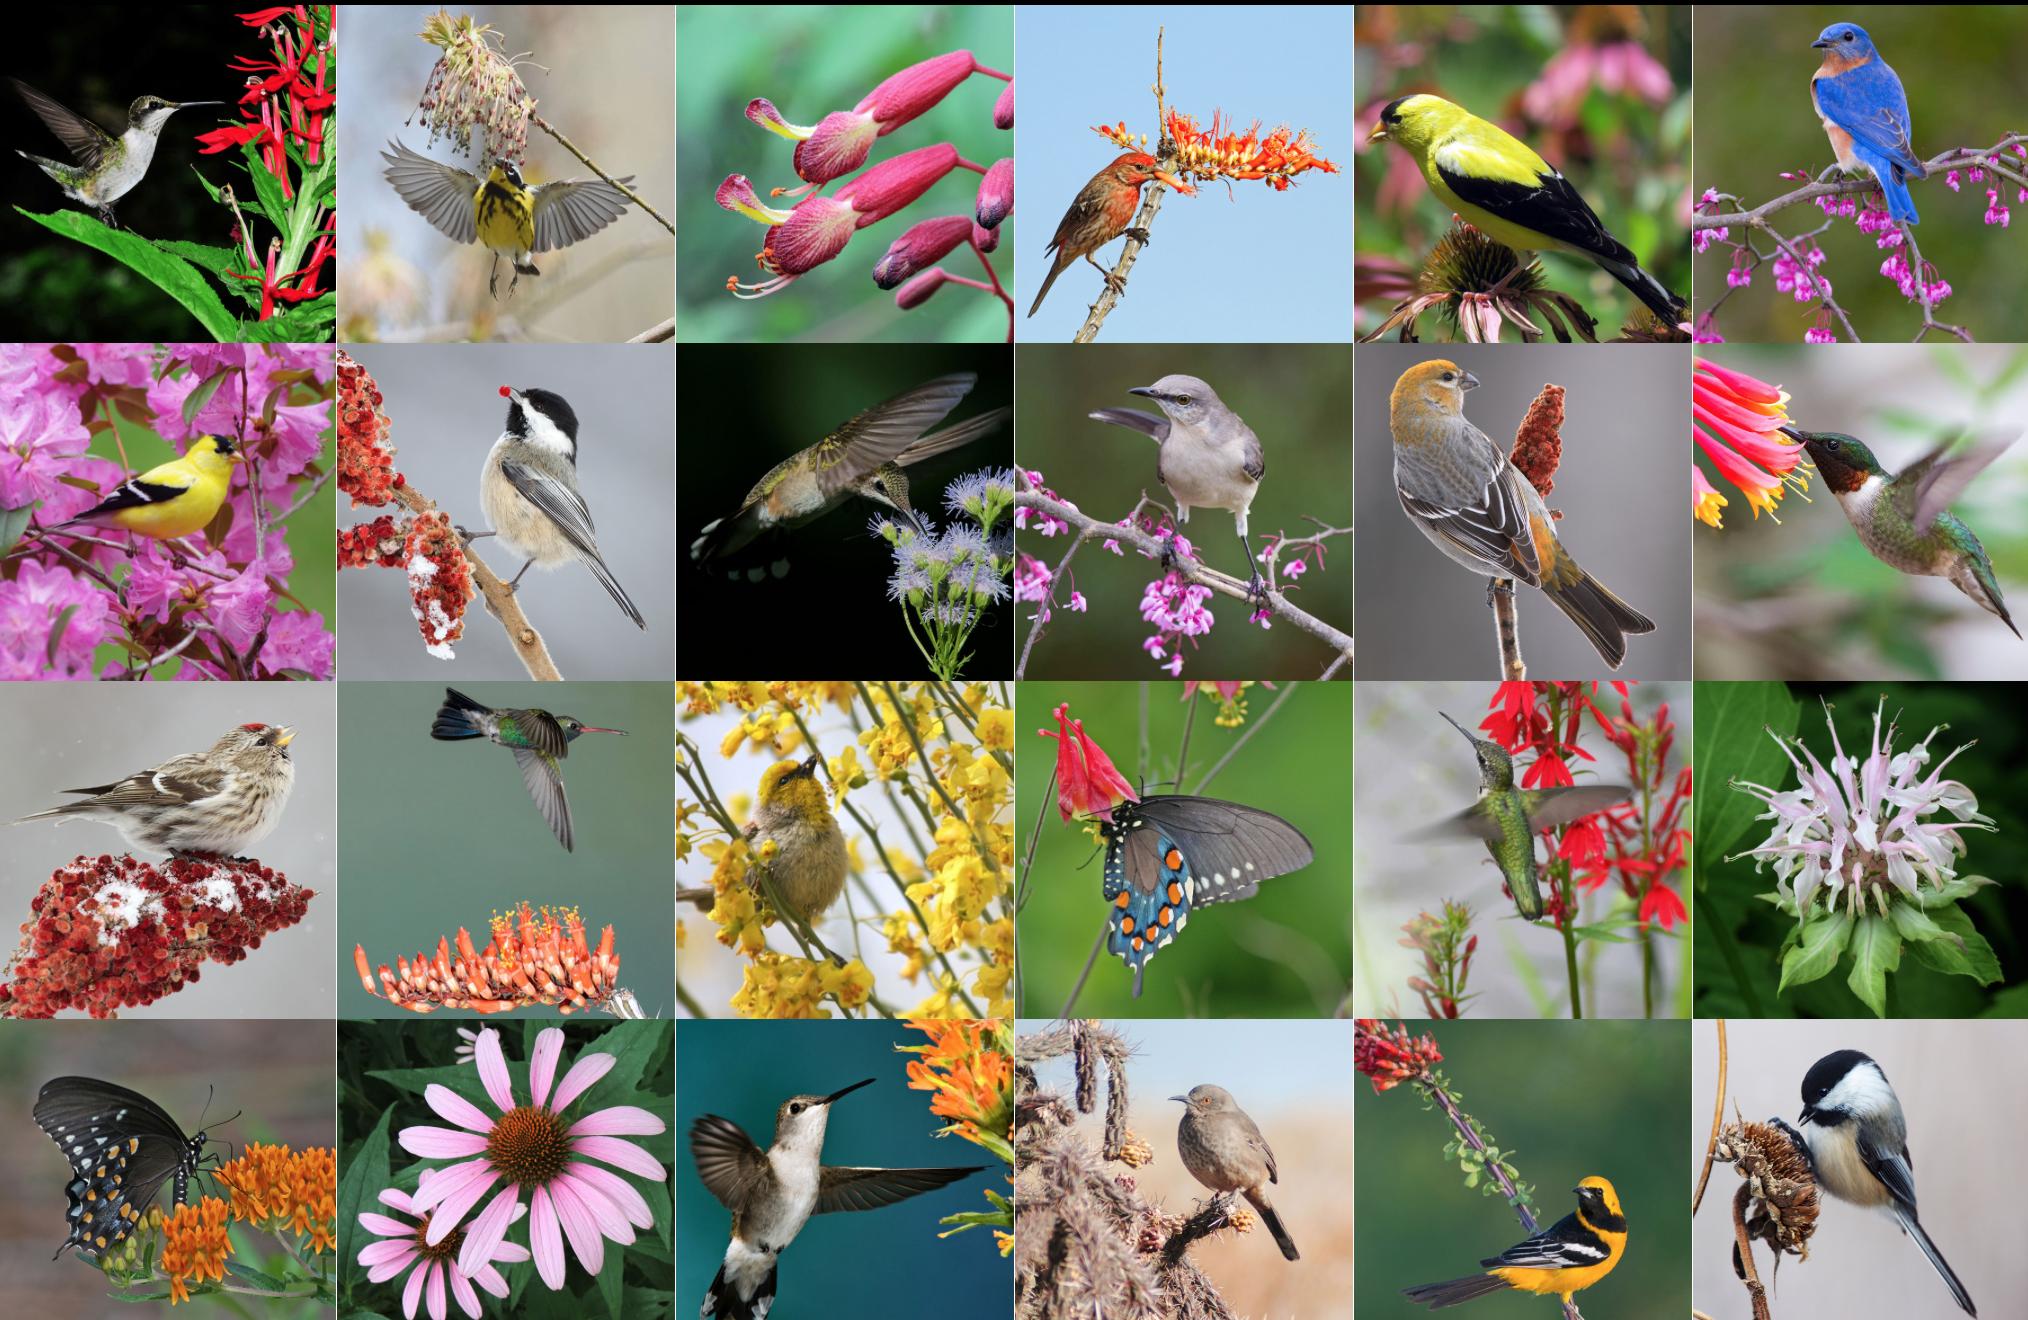 Photos: Top row, left to right: Tom Mayhew/Audubon Photography Awards (APA); Dennis Derby/APA; Will Stuart; Philip Sonier/APA; Victoria Ambrosey/APA; Glenda Simmons/Great Backyard Bird Count (GBBC). Row 2: Christopher Mann/APA; Missy Mandel/GBBC; Carmen Elia/APA; Glenda Simmons/GBBC; Rejean Turgeon/GBBC; David Shipper/APA. Row 3: Missy Mandel/GBBC; David Daniels/APA; Lisa Langell/APA; Will Stuart; Kristen Cart/APA; Will Stuart. Bottom row: Will Stuart (2); Richard Pick/APA; Brandon Percival/GBBC; Virginia Short/APA; Jeanette Tasey/APA